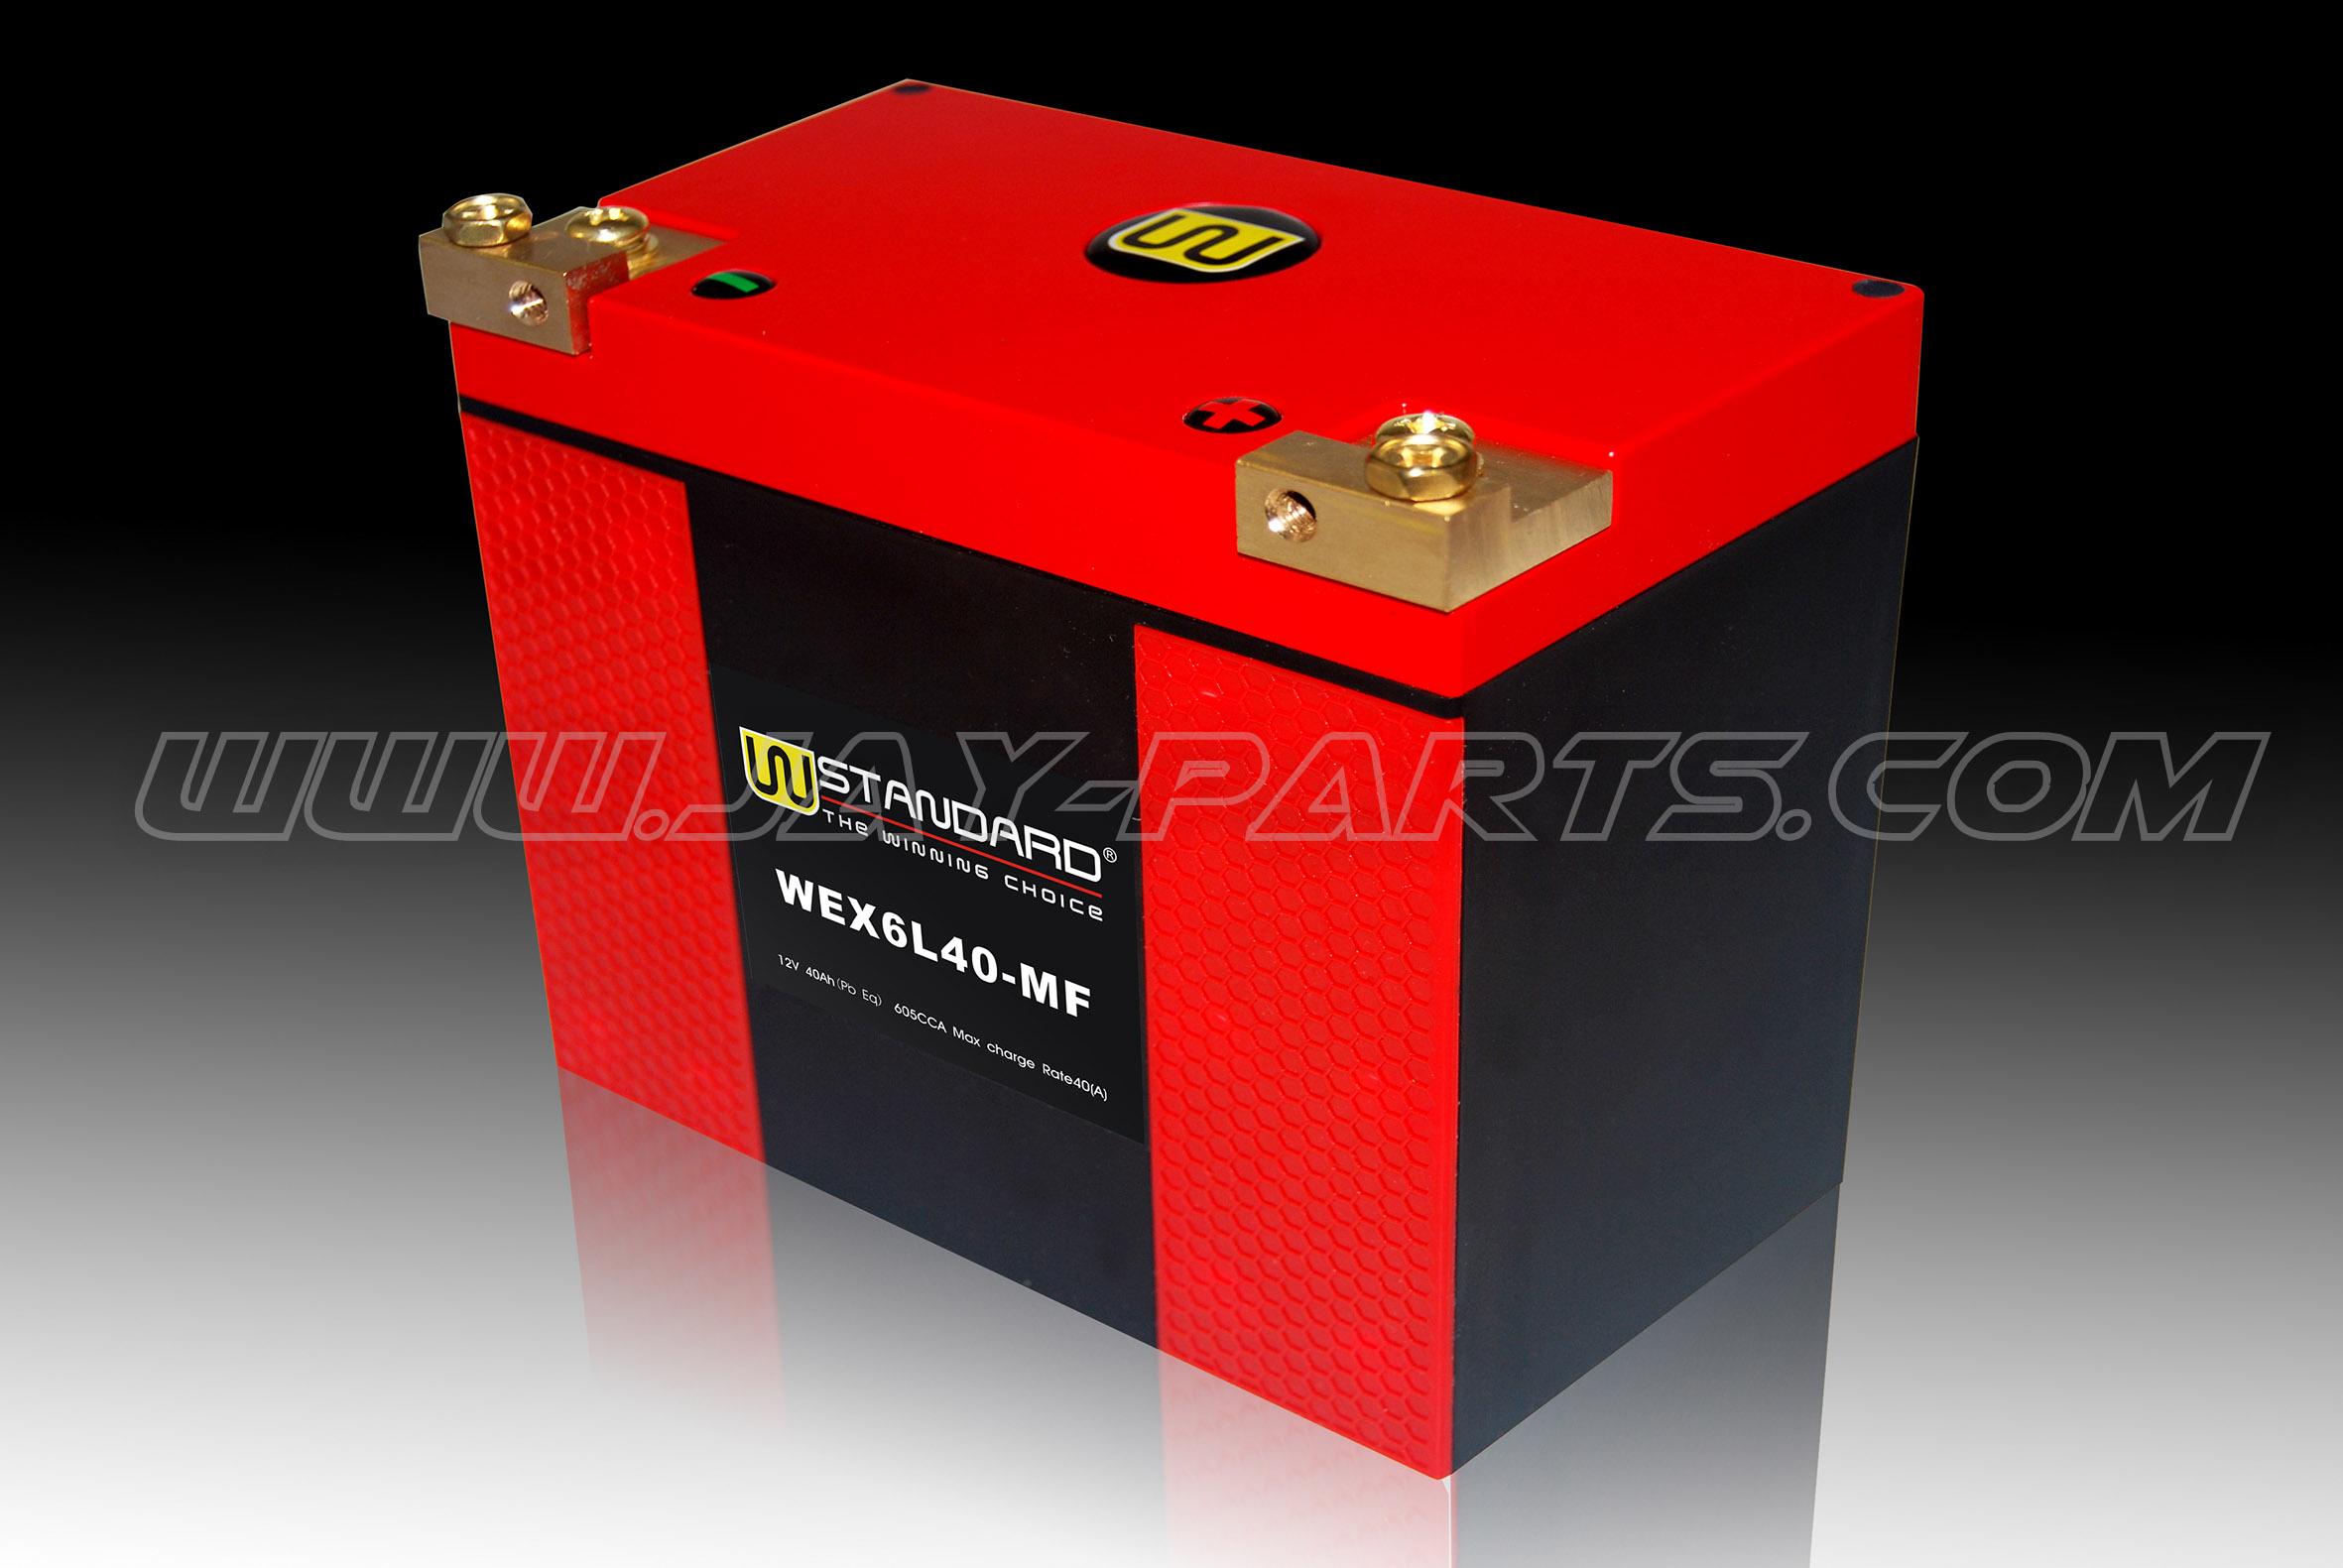 W-Standard Lithium Batterie WEX6L40-MF